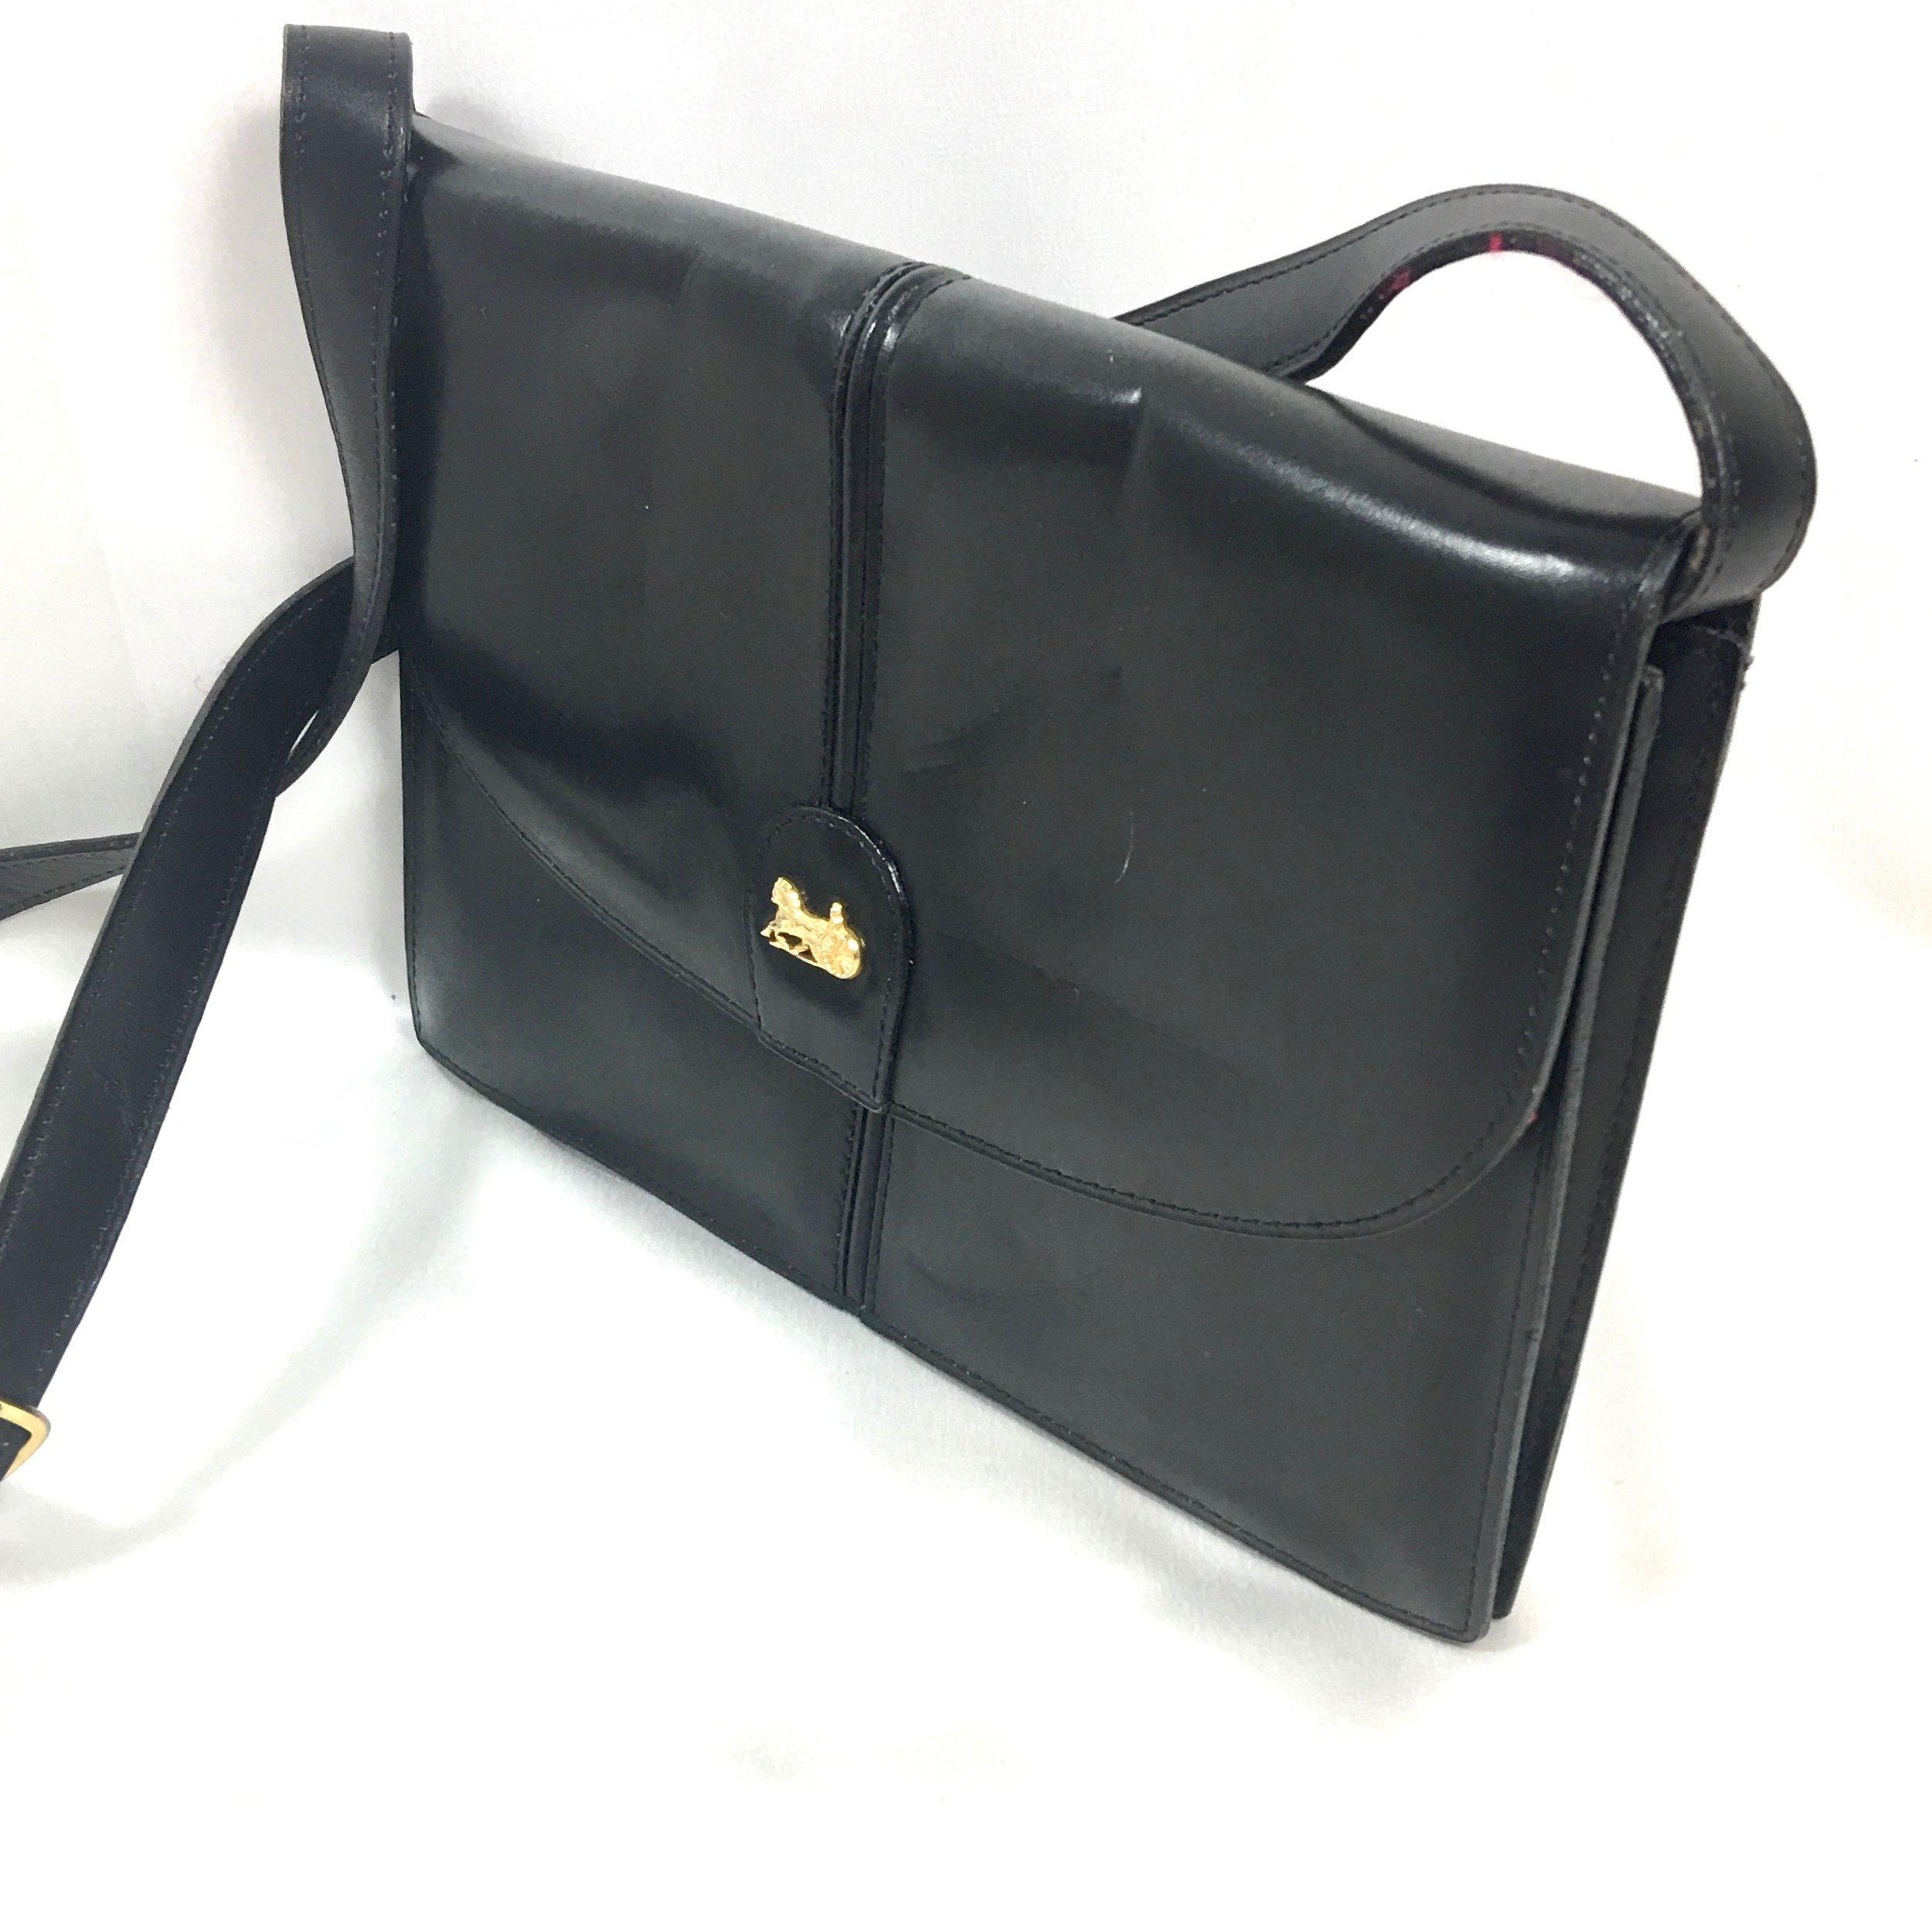 Céline-vintage-bag.jpg